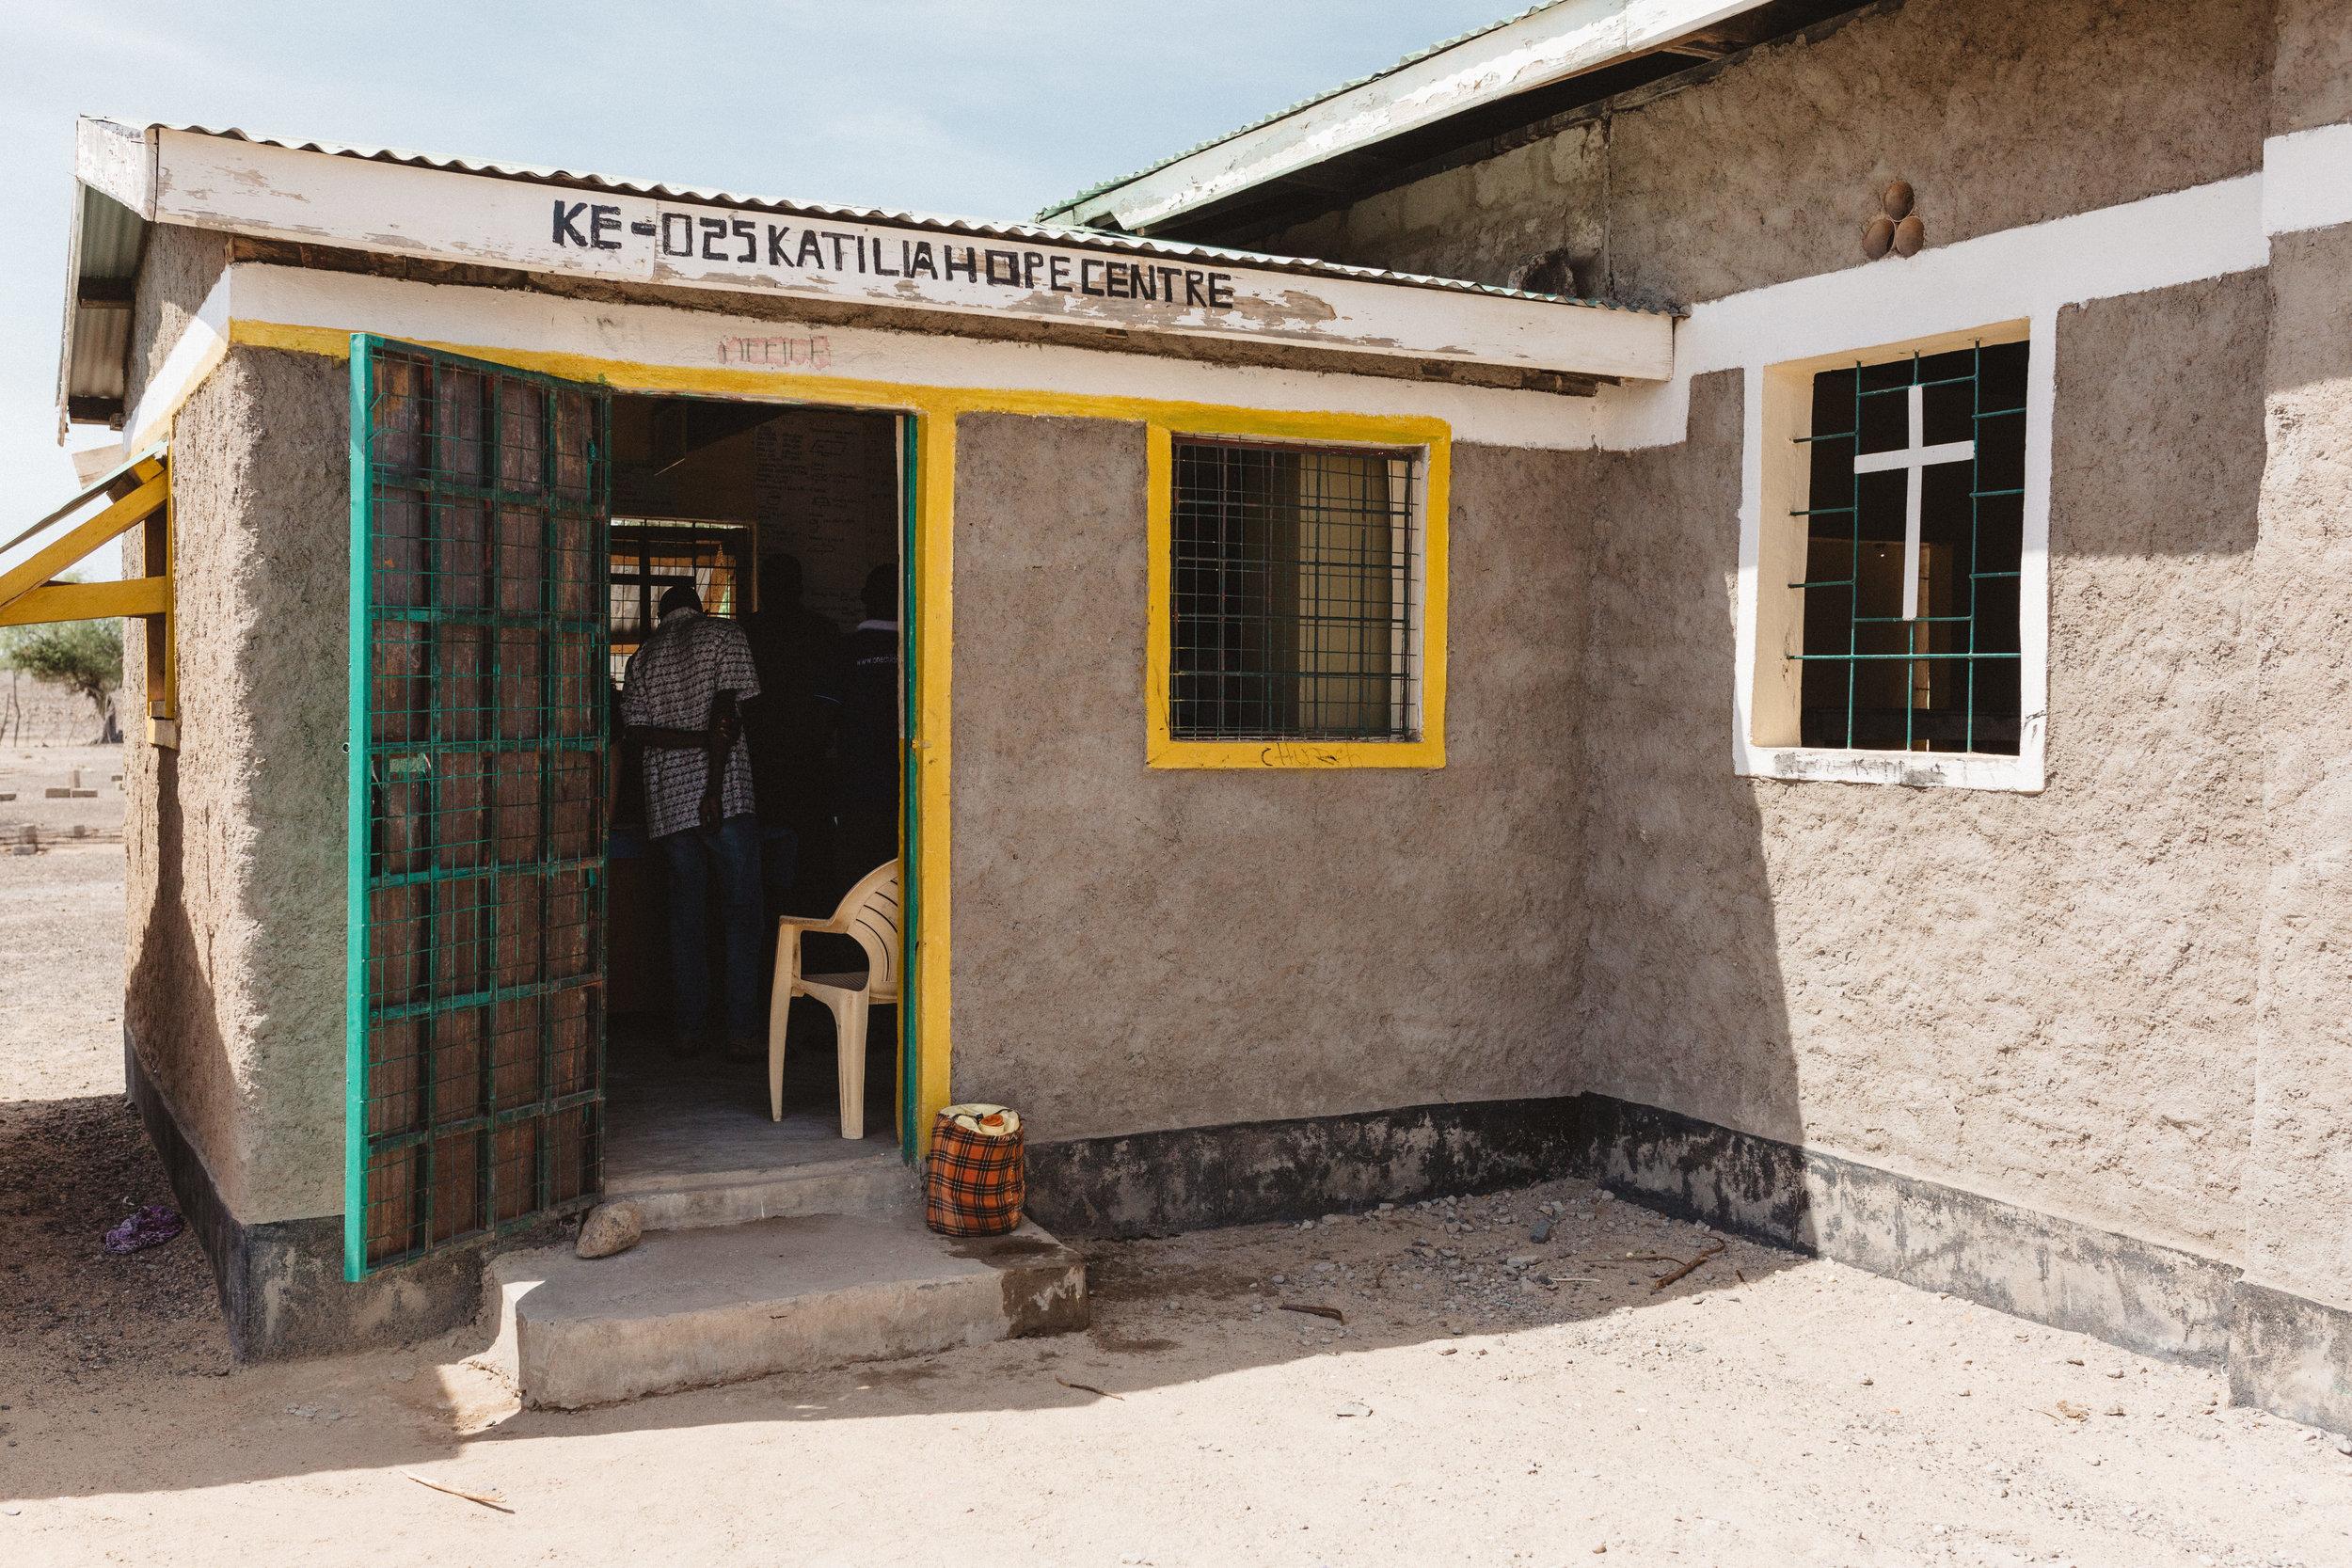 The office for KE-025 Hope Center in Katilia, Turkana.